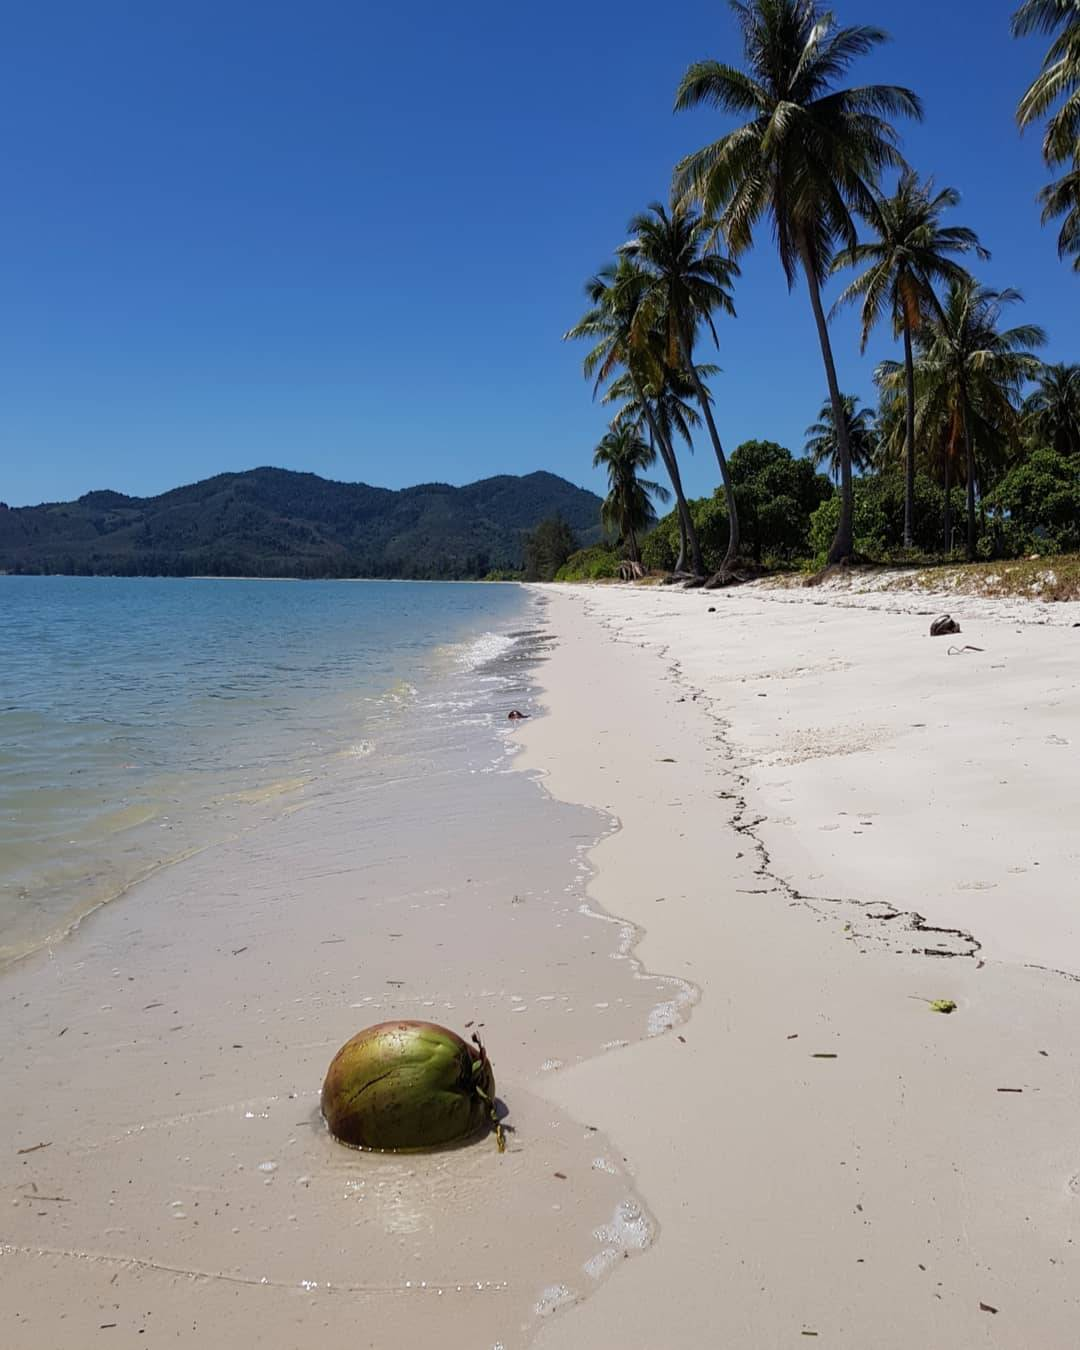 Coconut on the beach of Koh Yao Yai